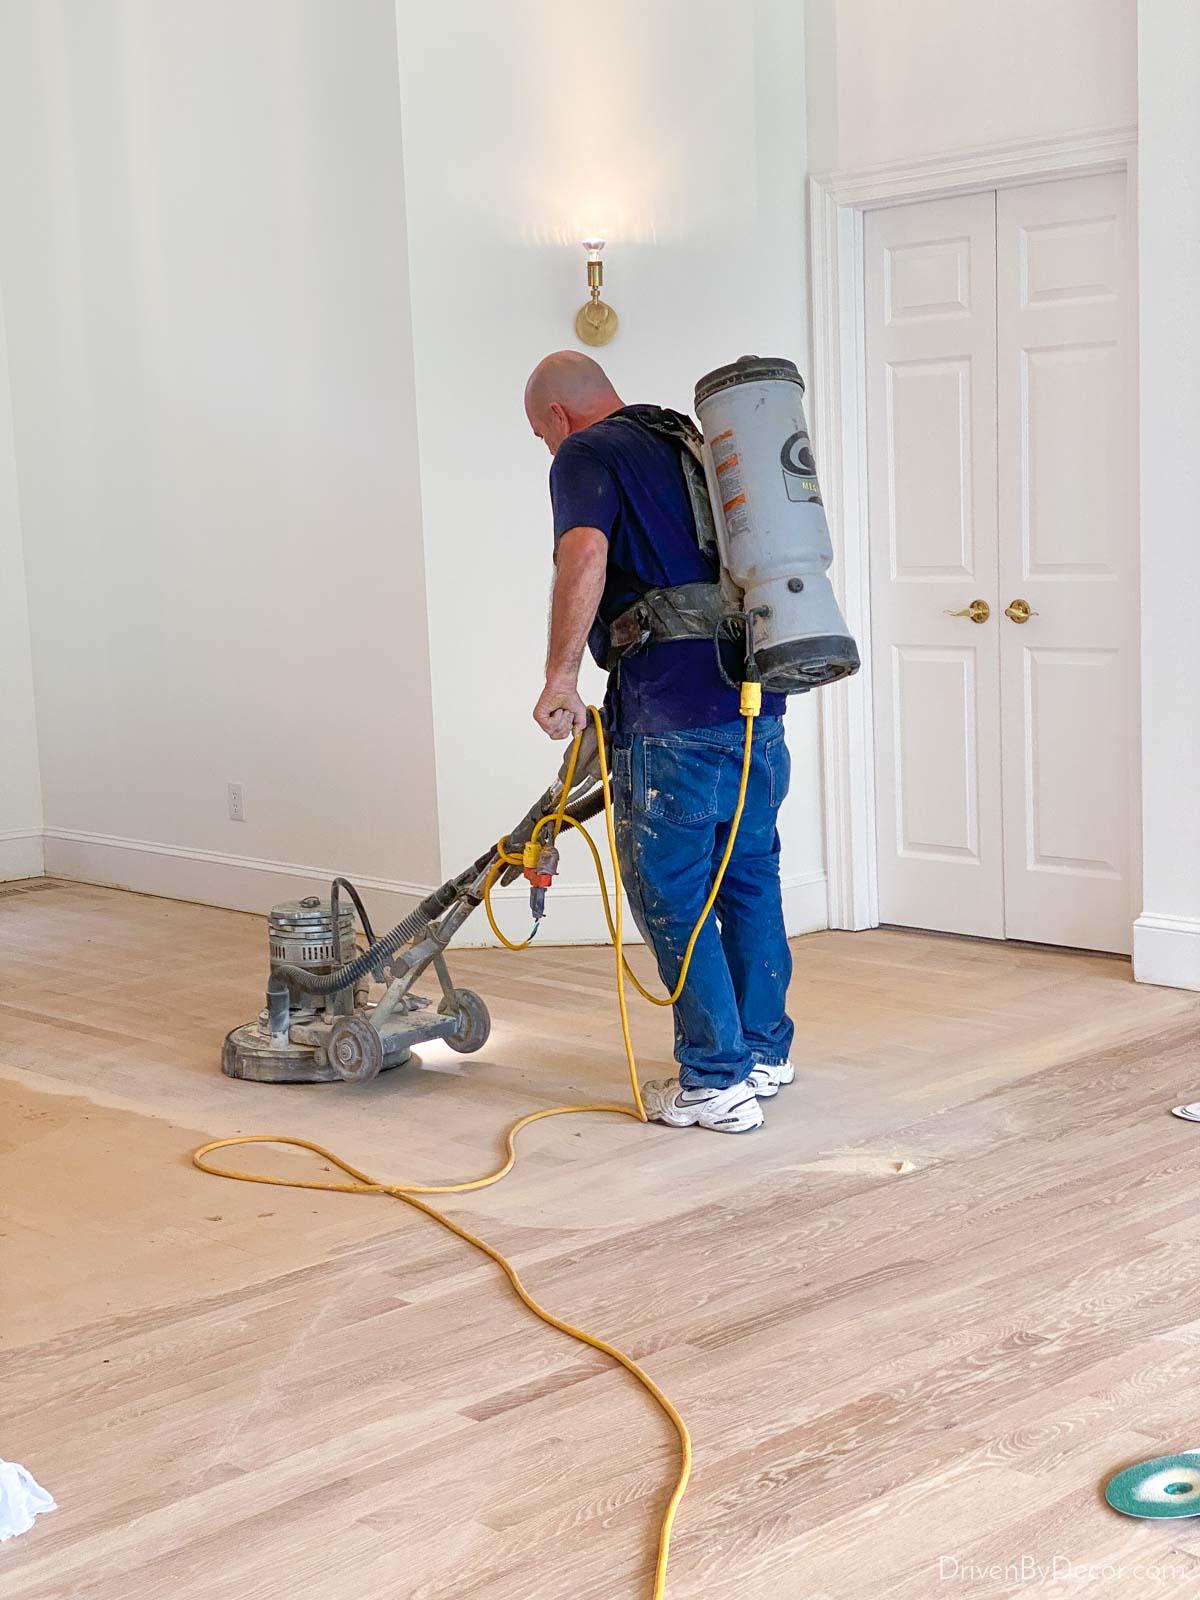 Dustless hardwood floor refinishing - sanding equipment is hooked up to a vacuum